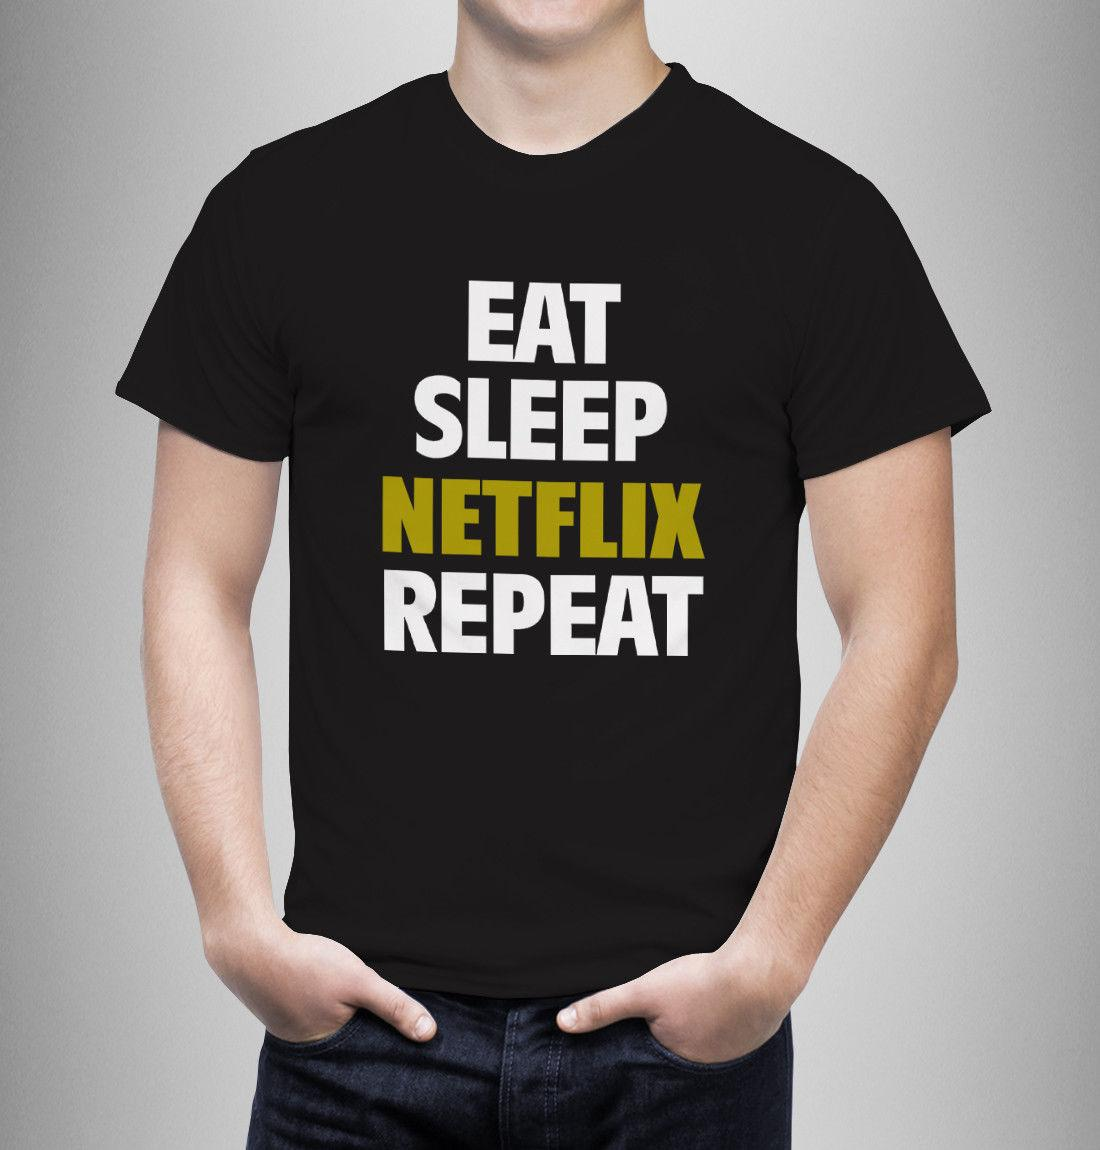 Eat Sleep NETFLIX Repeat TSHIRT Funny movies T Shirt Birthday gift adults  kids Funny free shipping Unisex Casual Tshirt